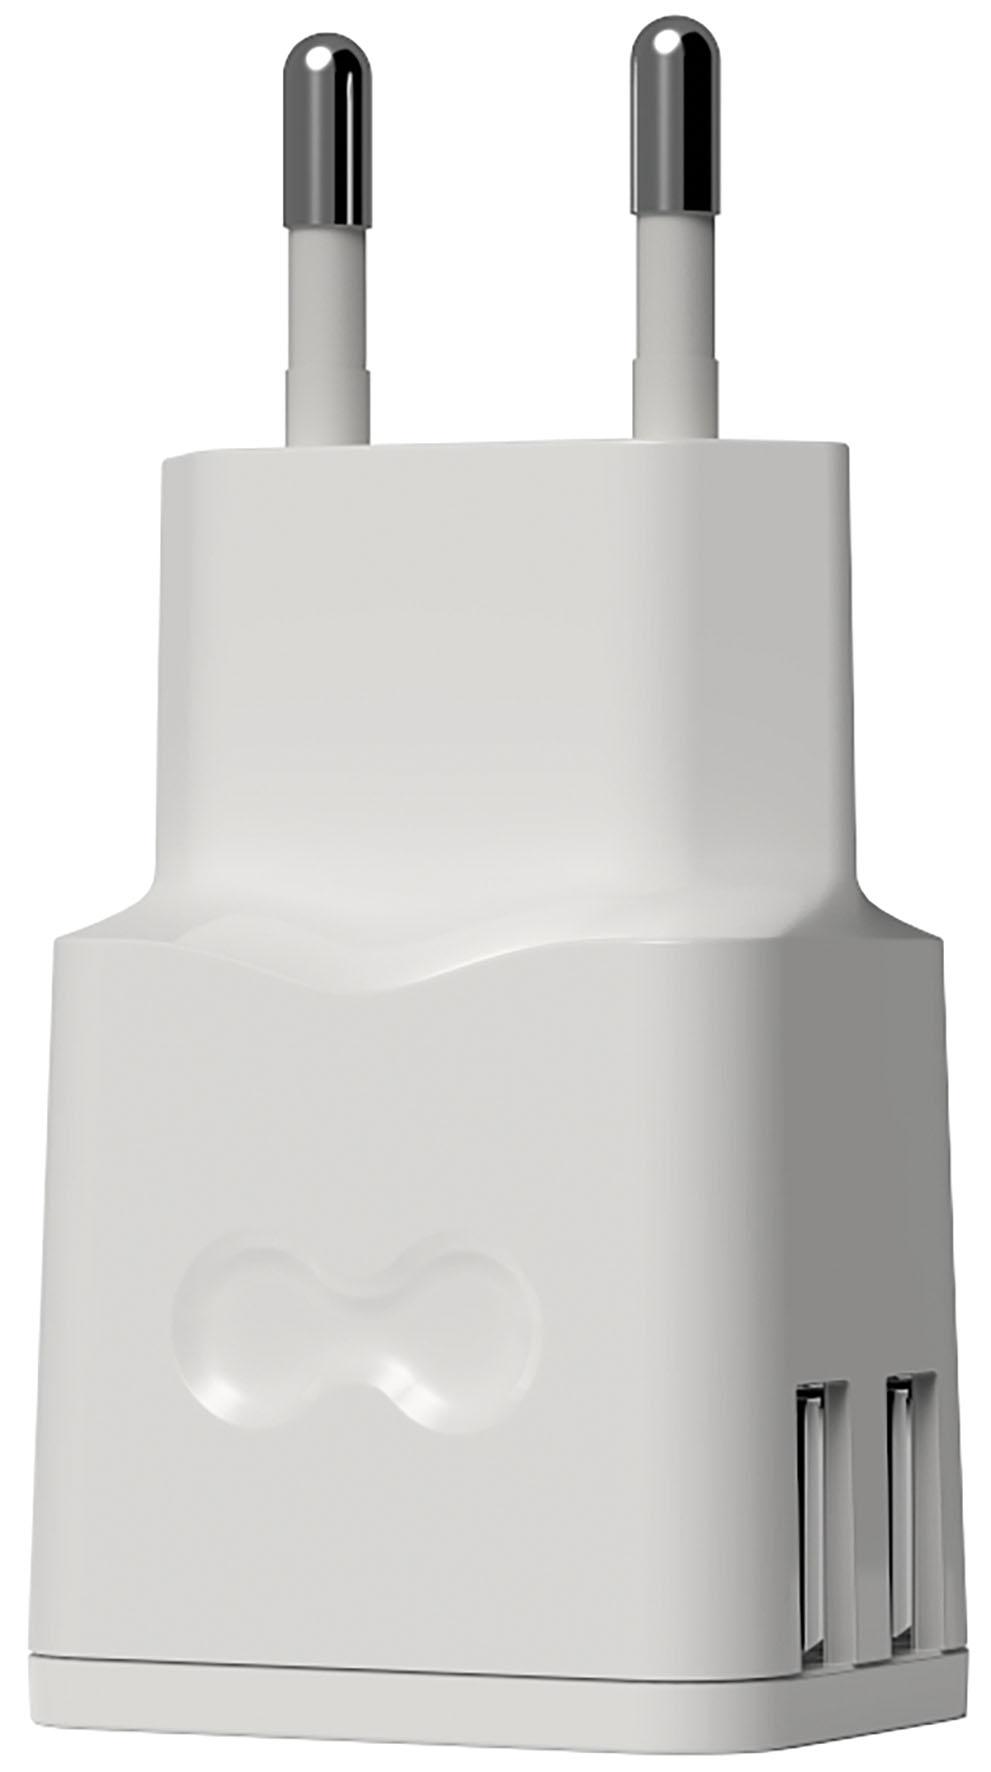 SPINA CARICATORE 2 USB